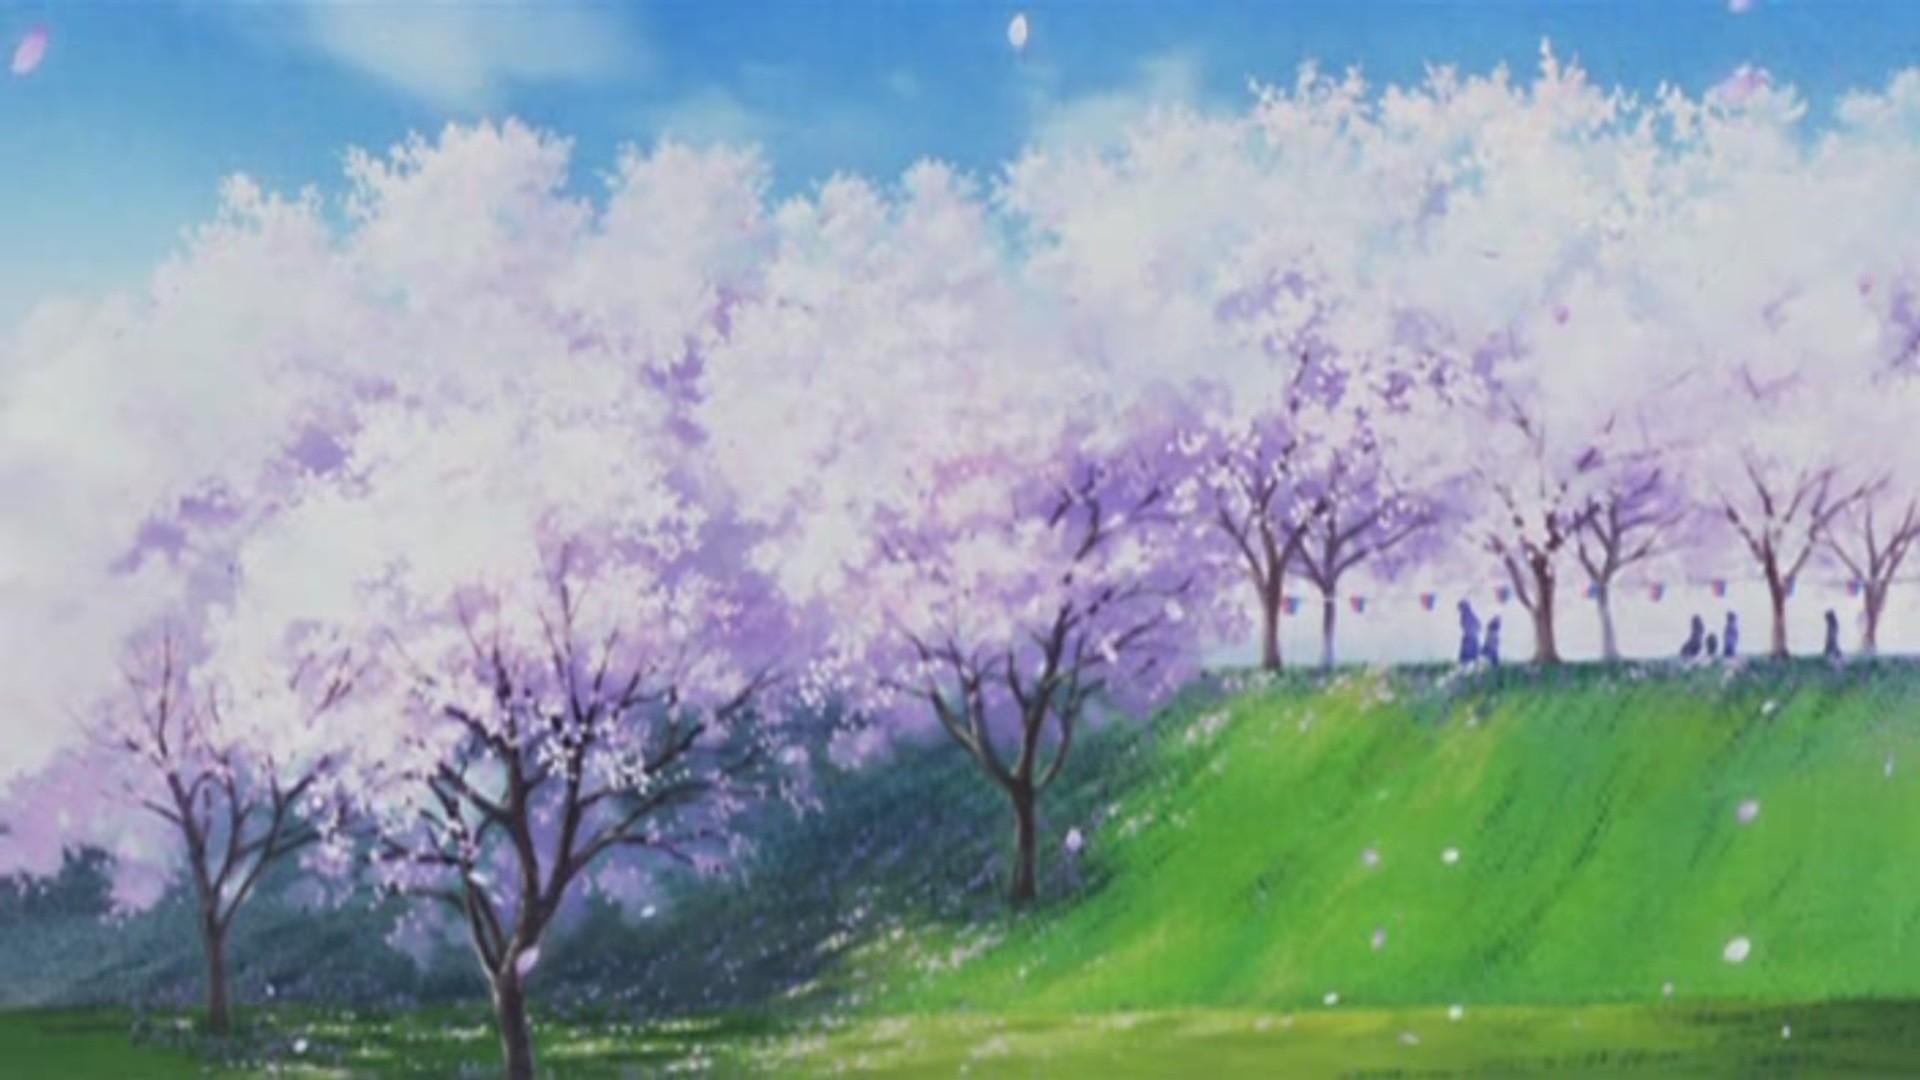 Anime cherry blossom wallpaper 72 images - Anime scenery wallpaper laptop ...